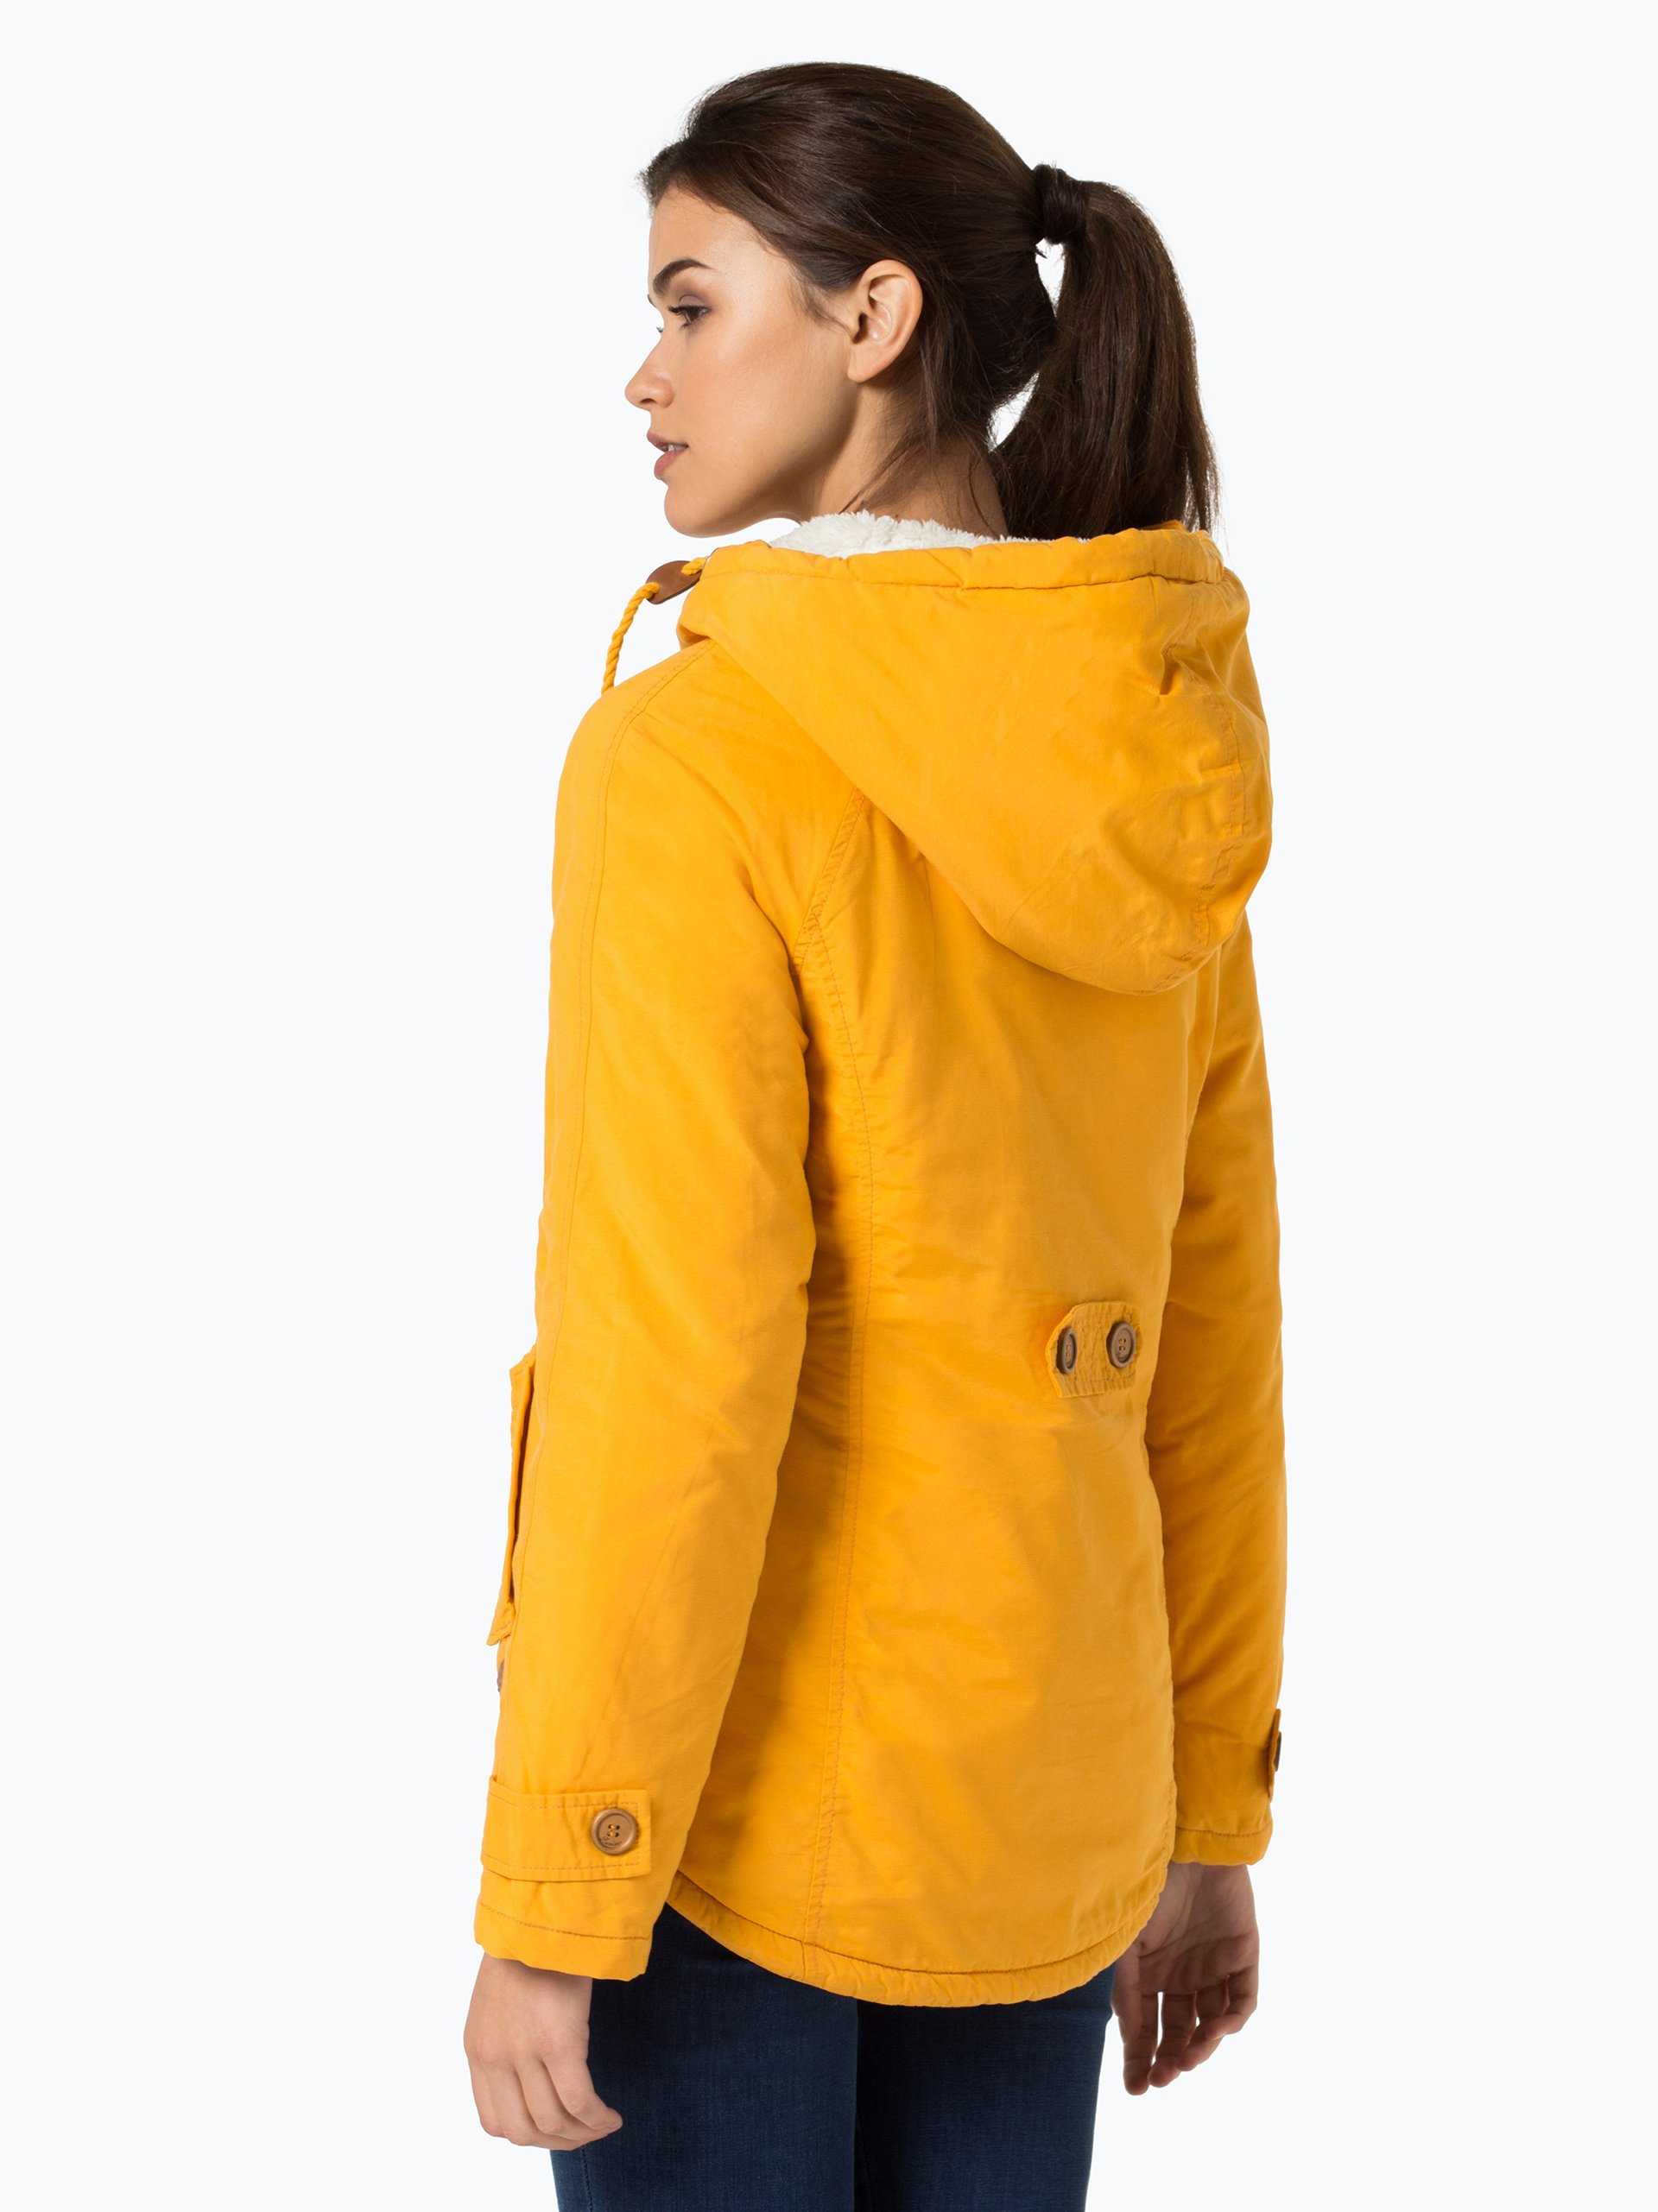 review damen jacke orange gelb uni online kaufen peek. Black Bedroom Furniture Sets. Home Design Ideas